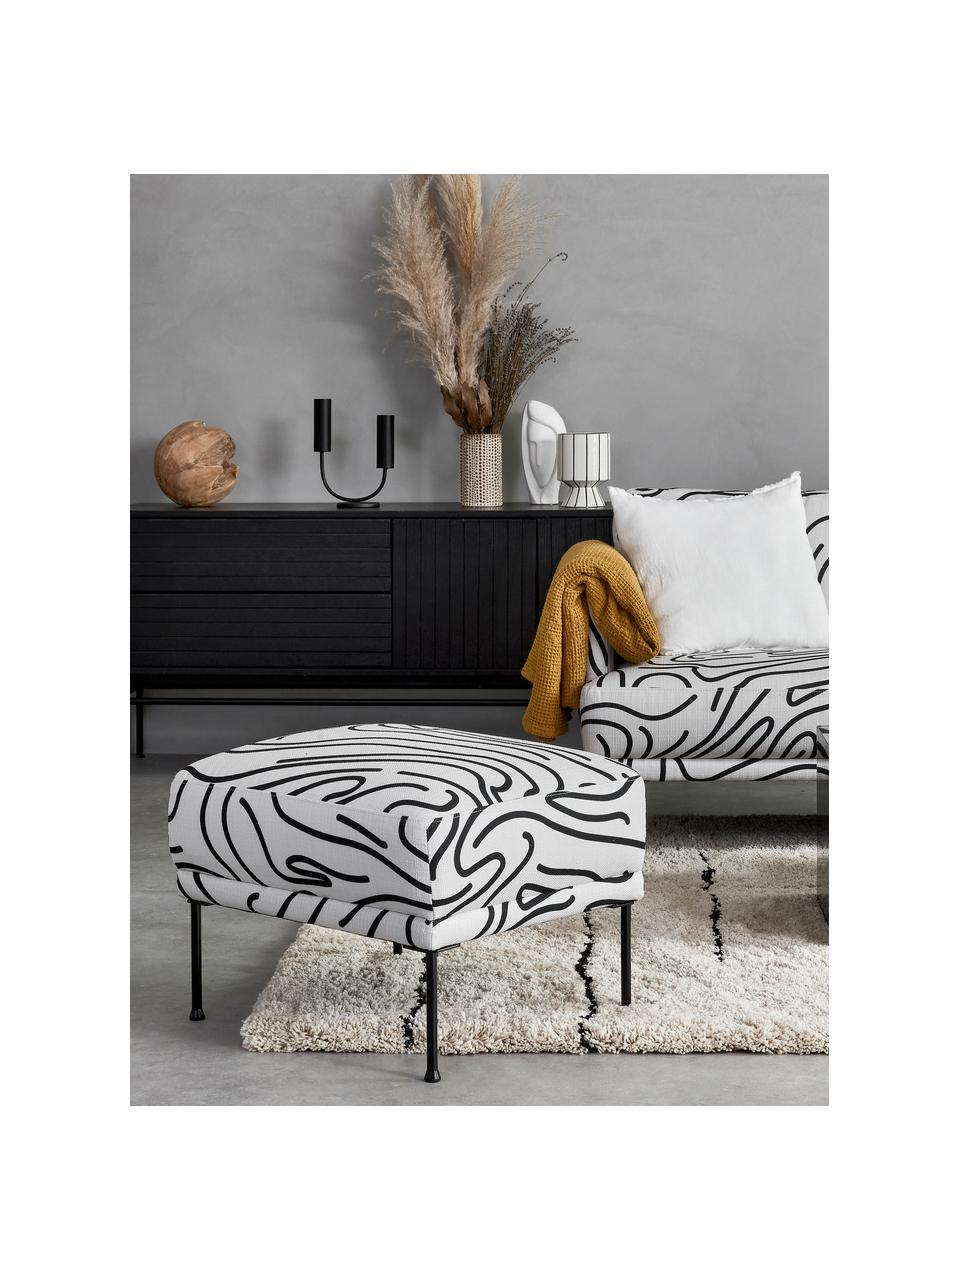 Tabouret/repose-pieds noir et blanc Fluente, Tissu blanc/noir